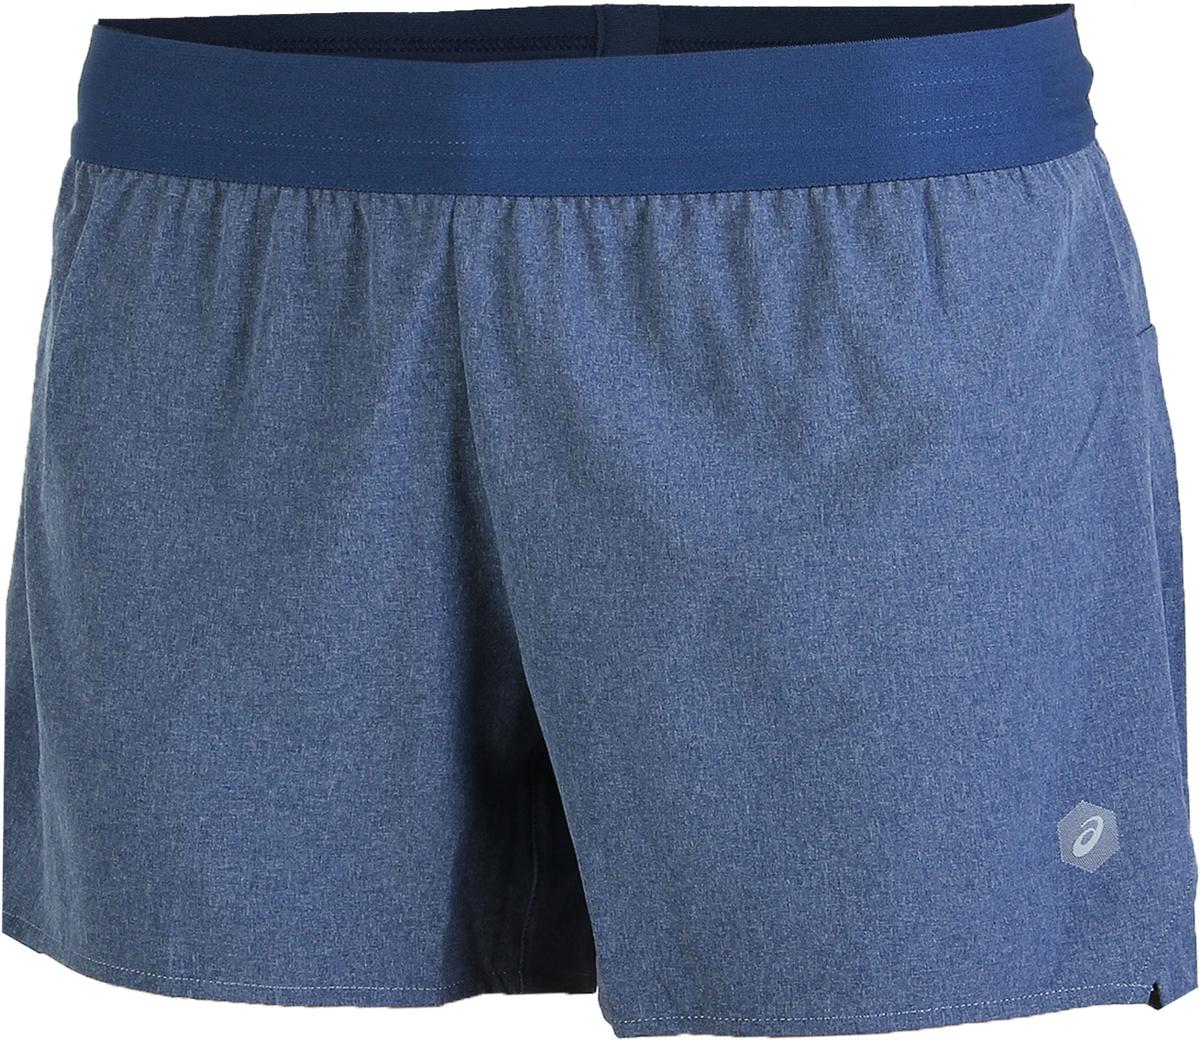 Шорты женские Asics 3,5in Short Woven, цвет: синий. 154553-1273. Размер XS (42) цена